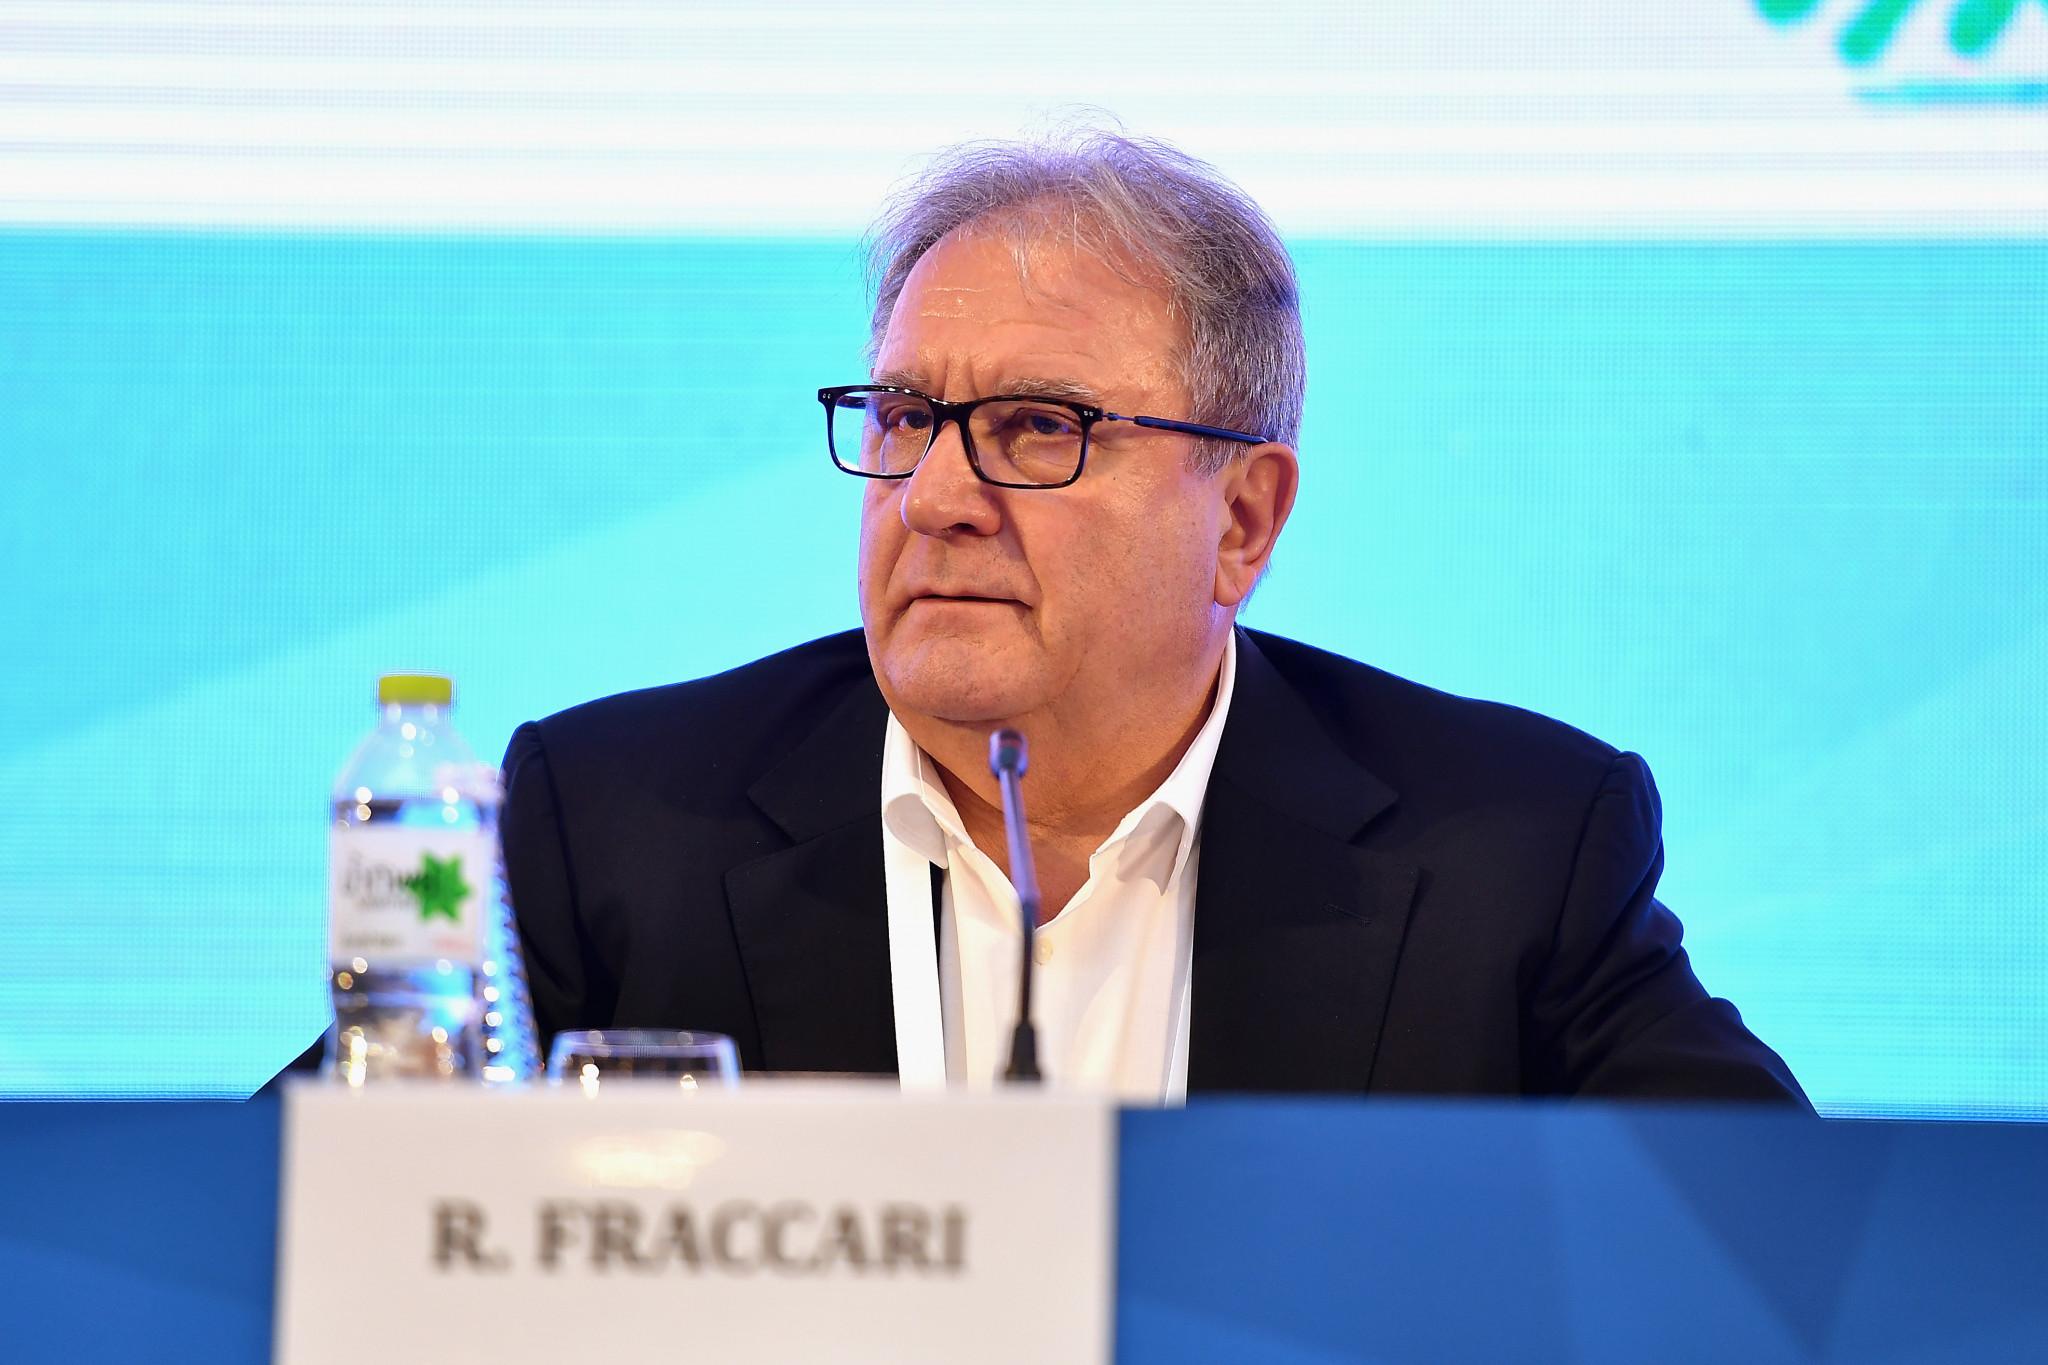 WBSC President Riccardo Fraccari has said that the WBSC is